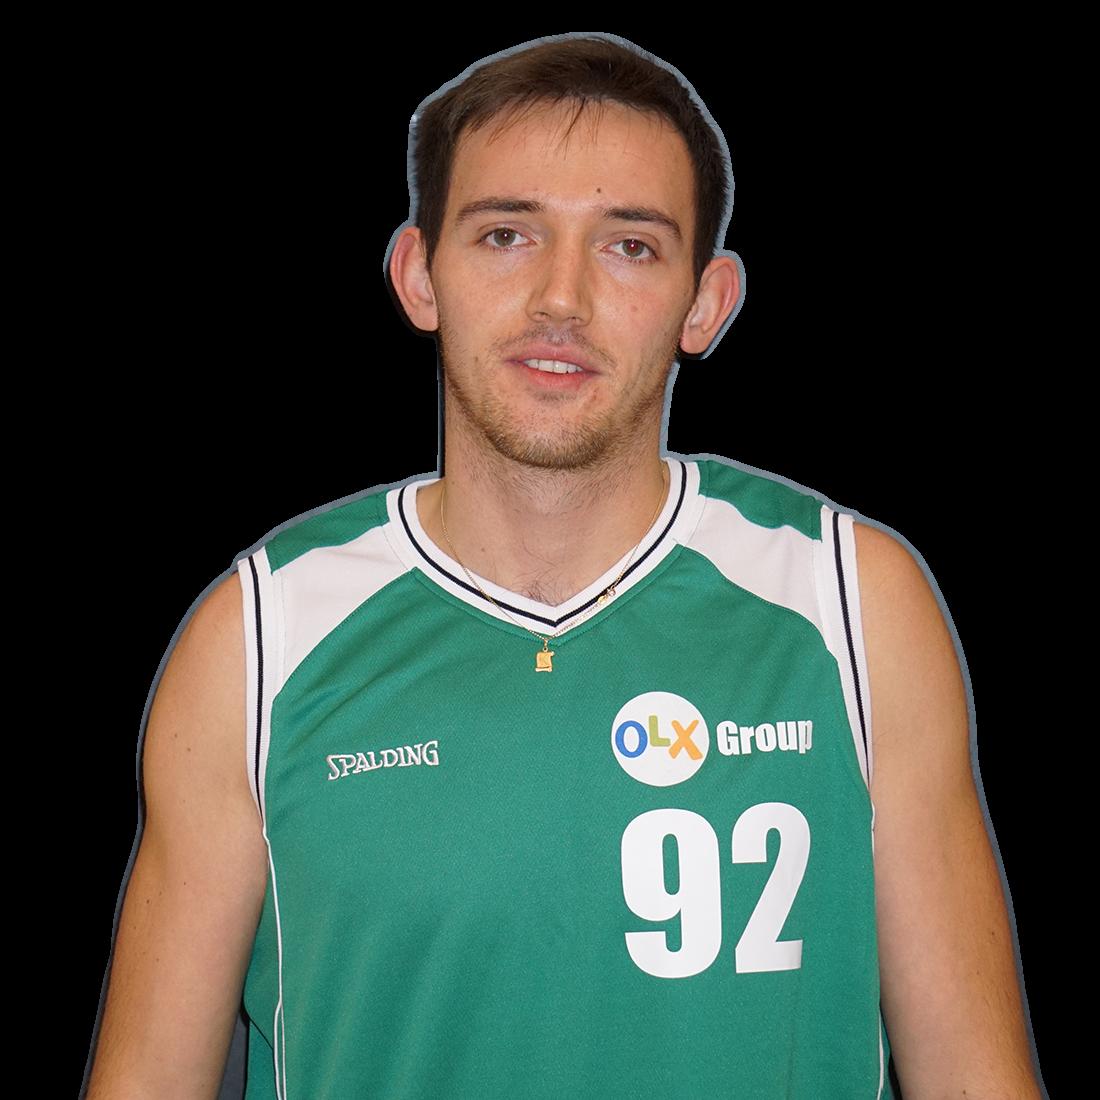 Kamil Banasiewicz